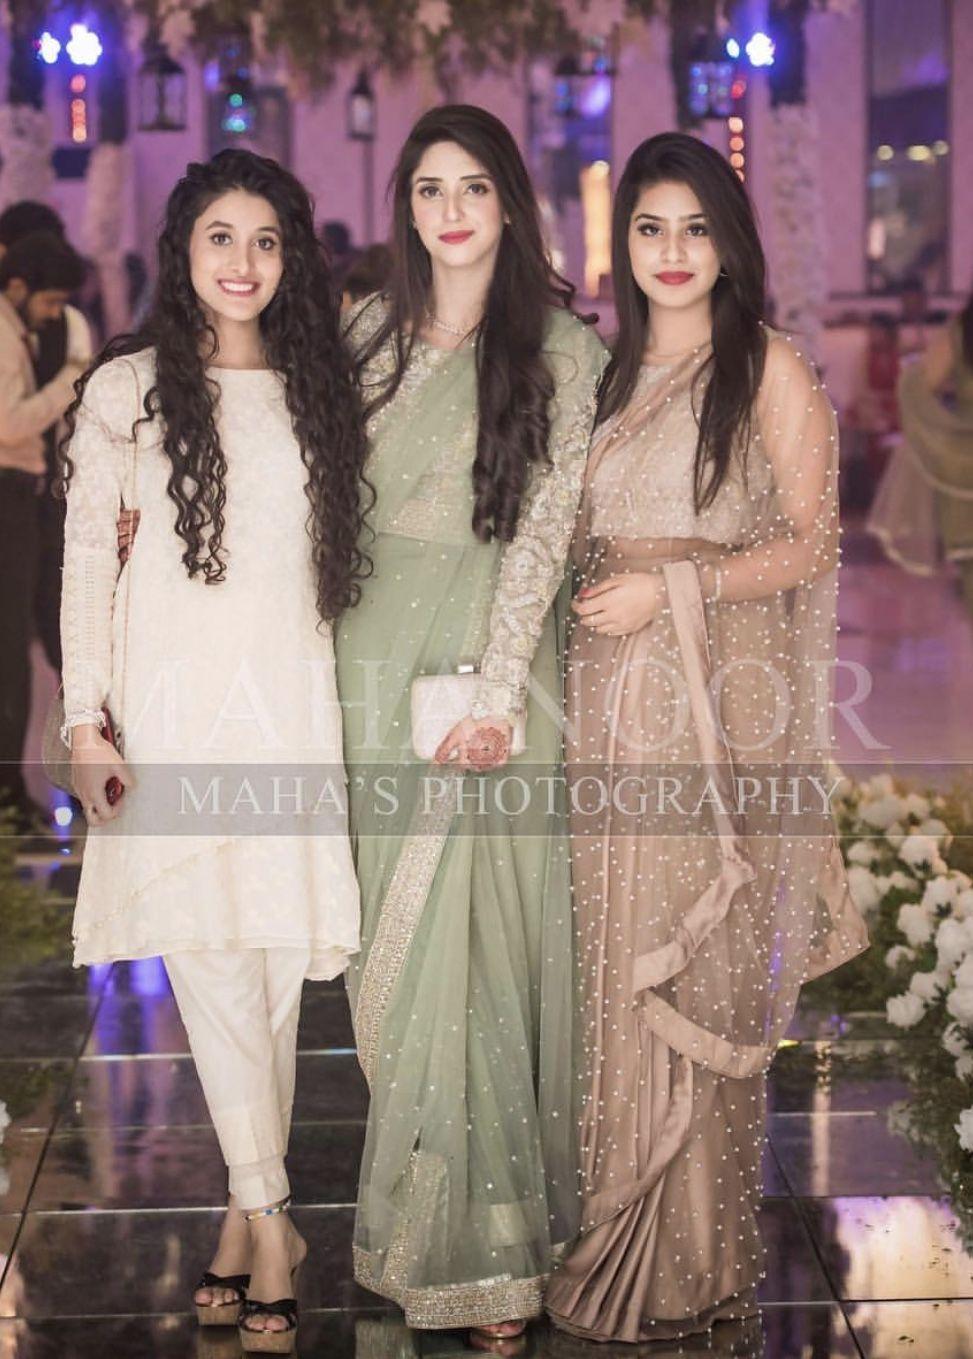 brides sister and cousins | formal/informal dresses in 2019